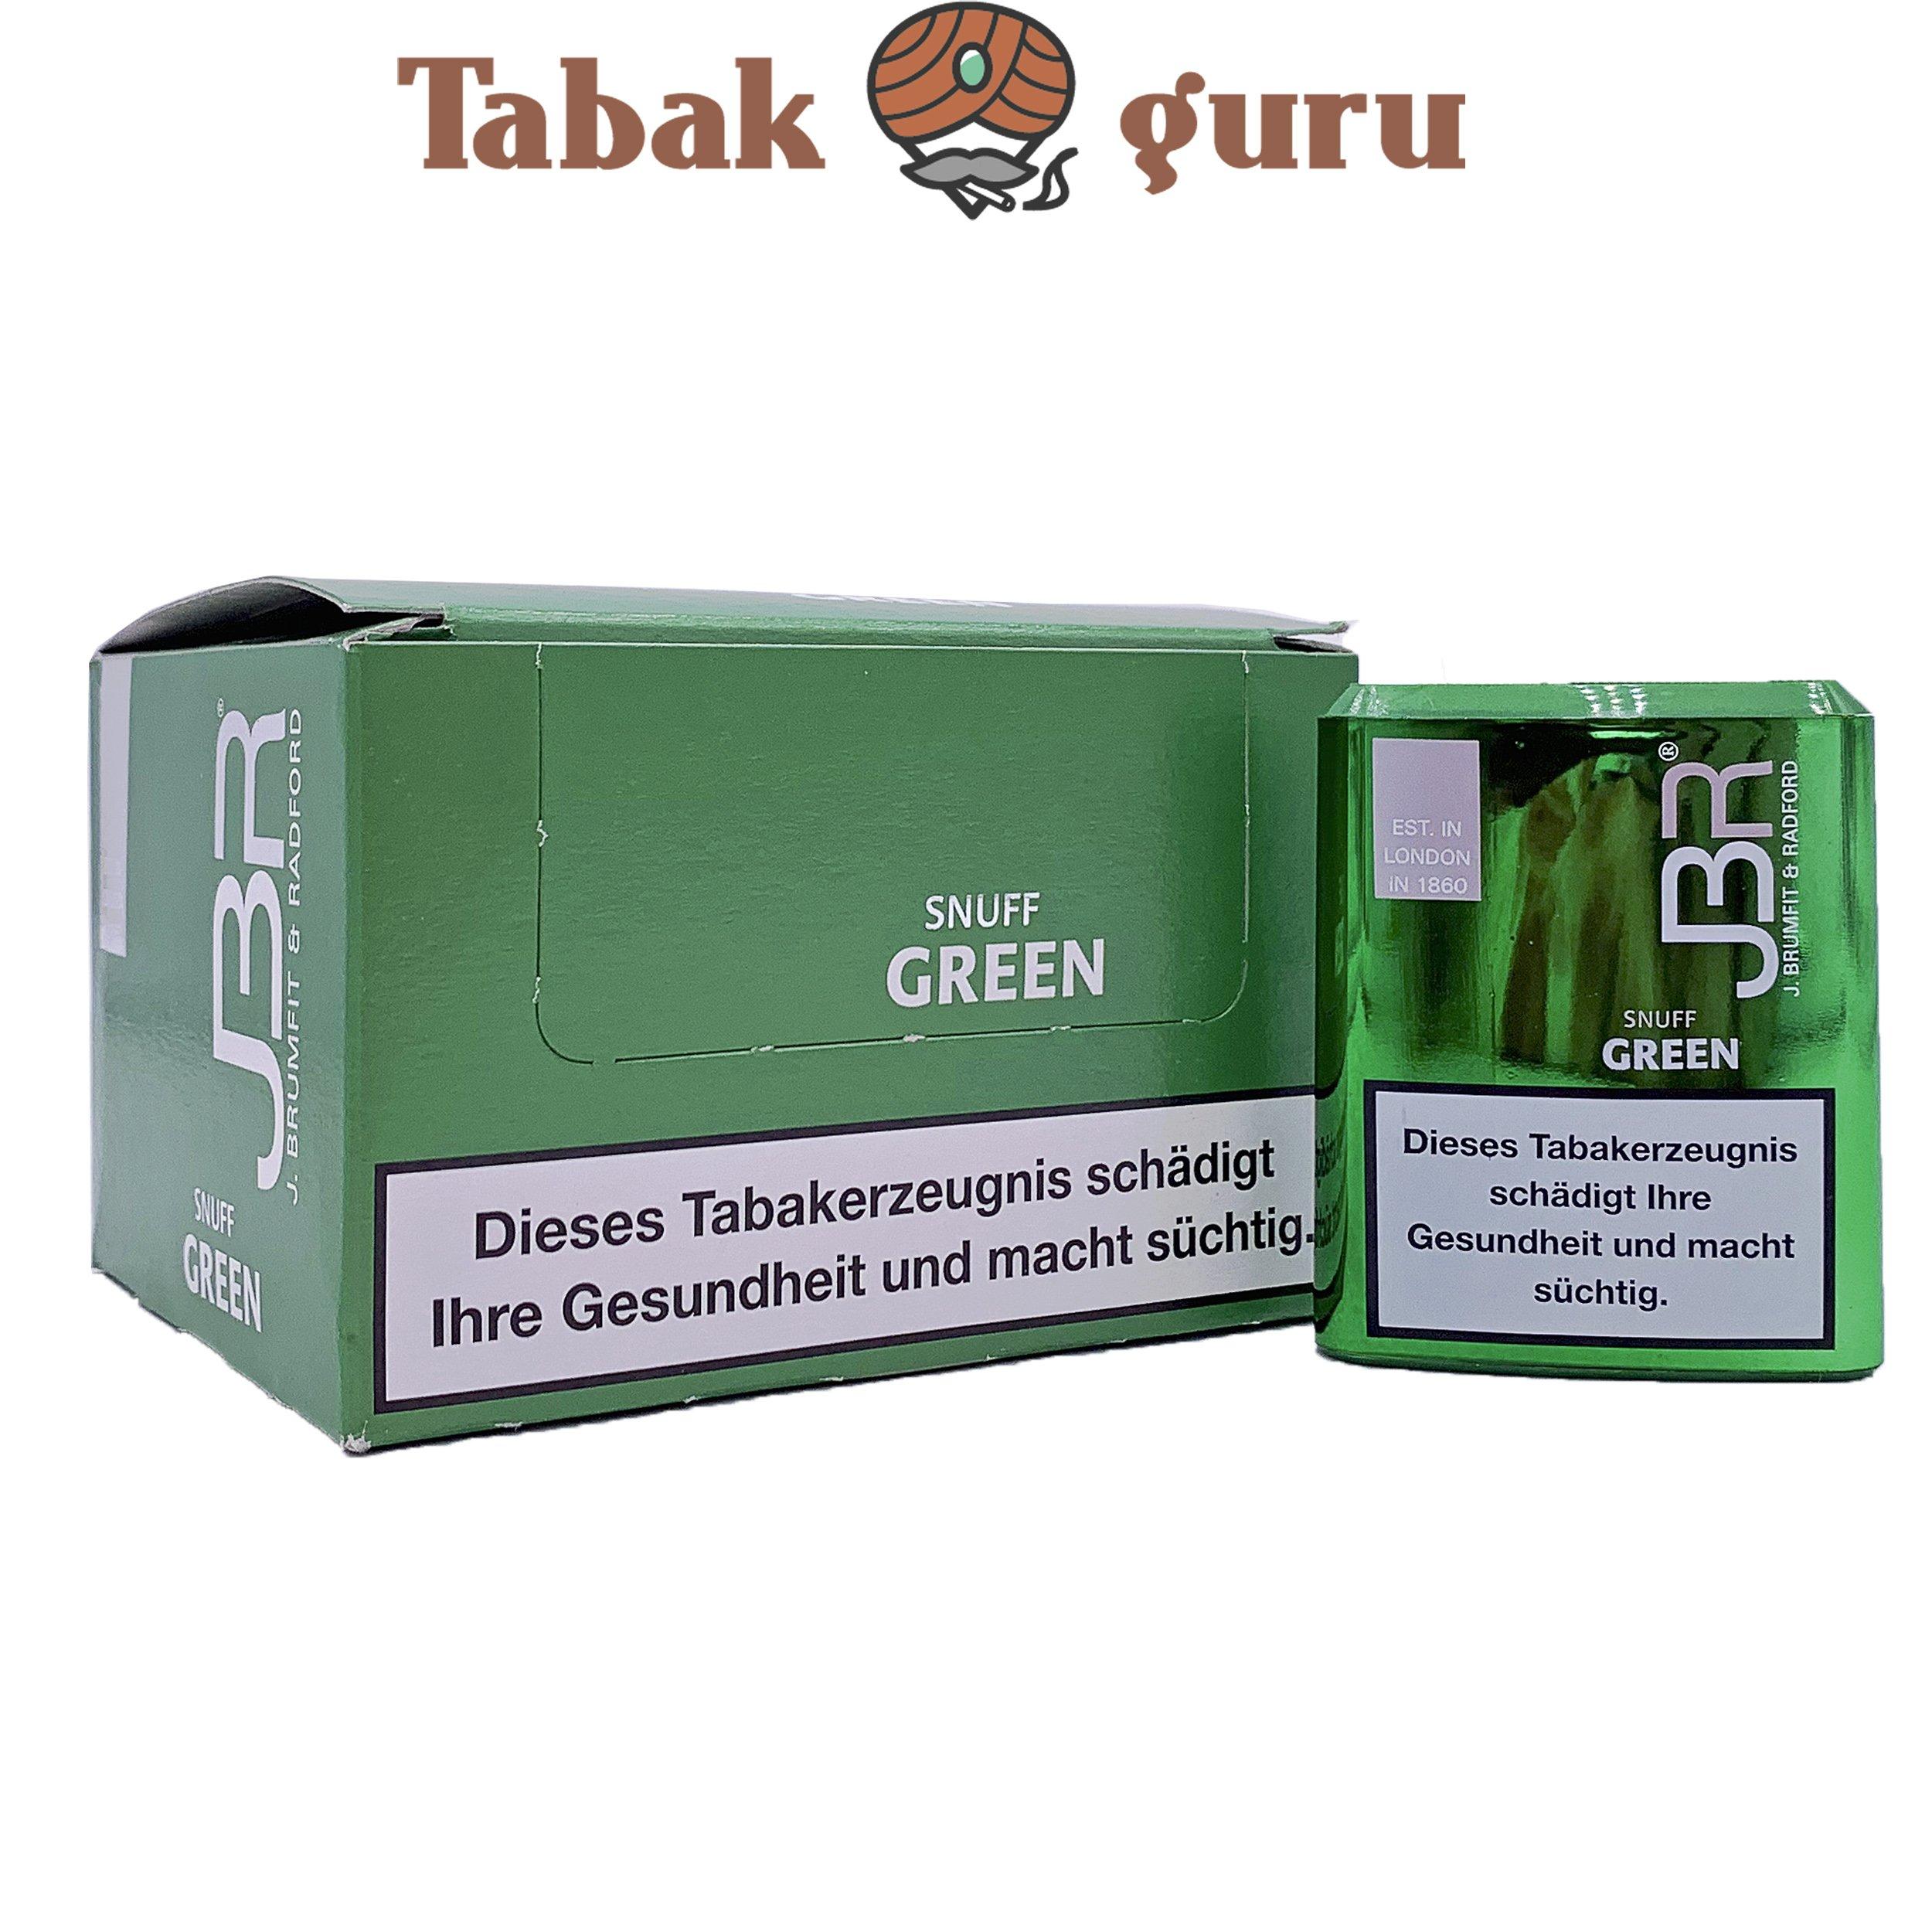 10 x JBR Green Shnuff Schnupftabak